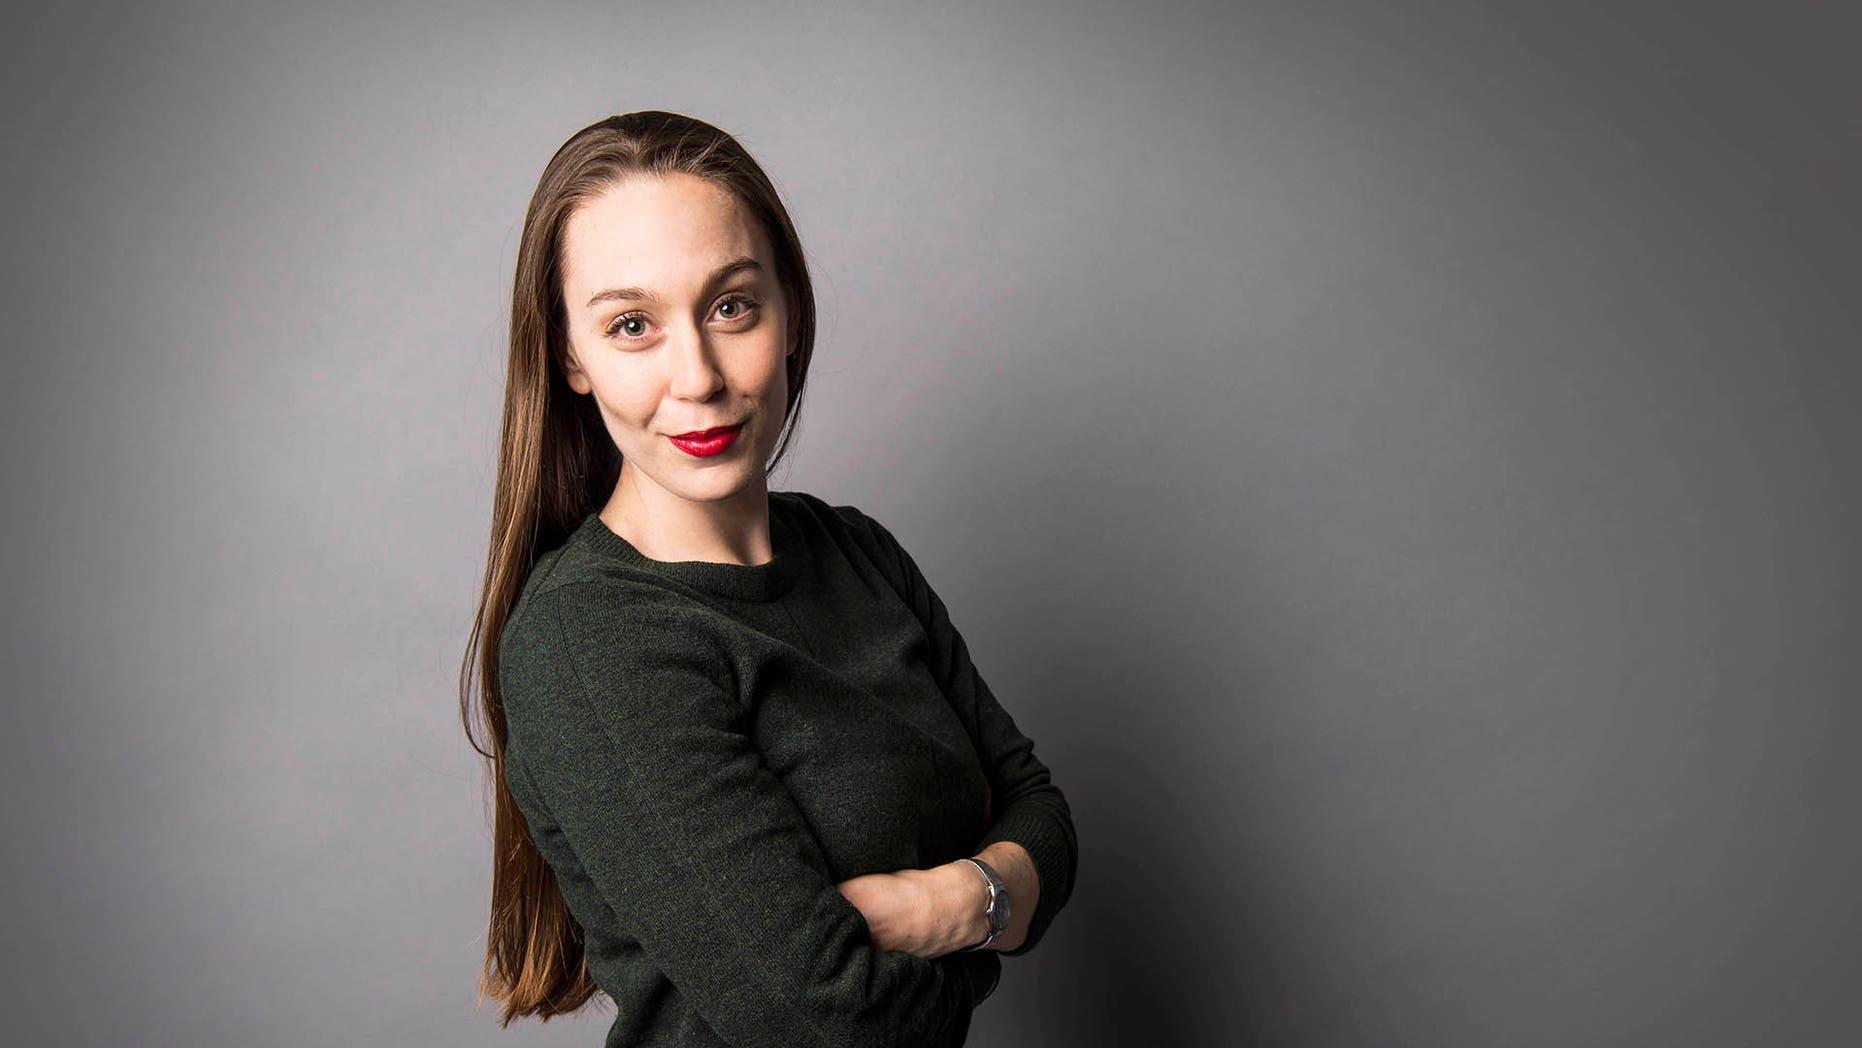 HuffPost deputy opinion editor Chloe Angyal